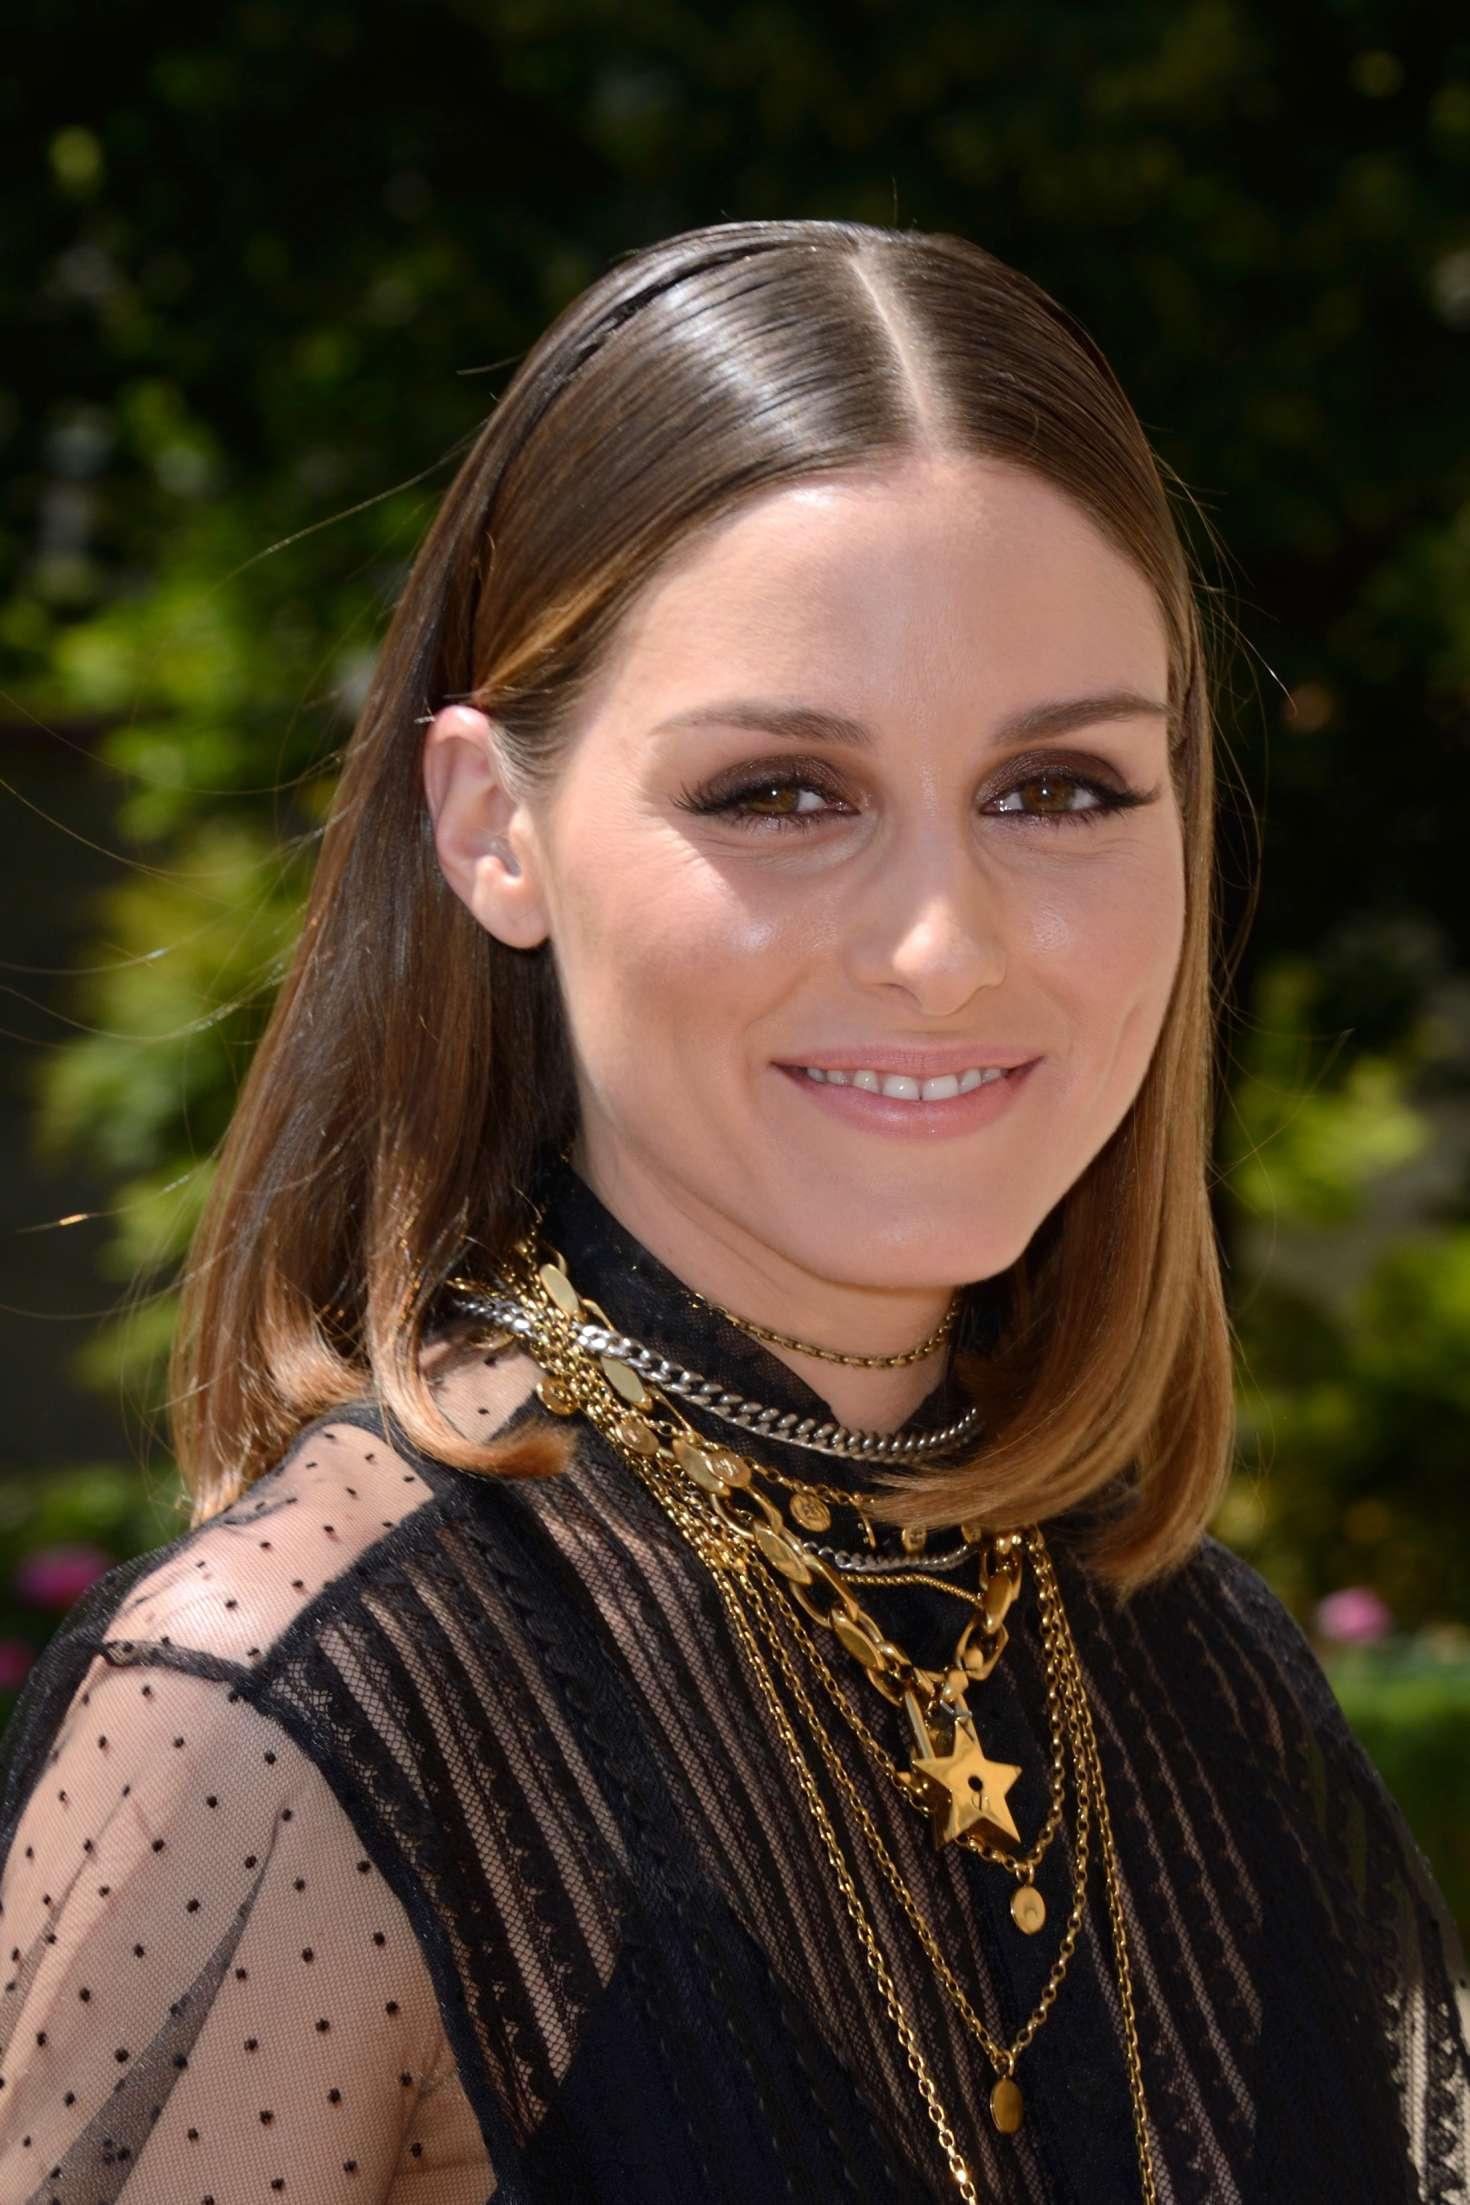 Olivia Palermo - Christian Dior Haute Couture Show 2019 in Paris